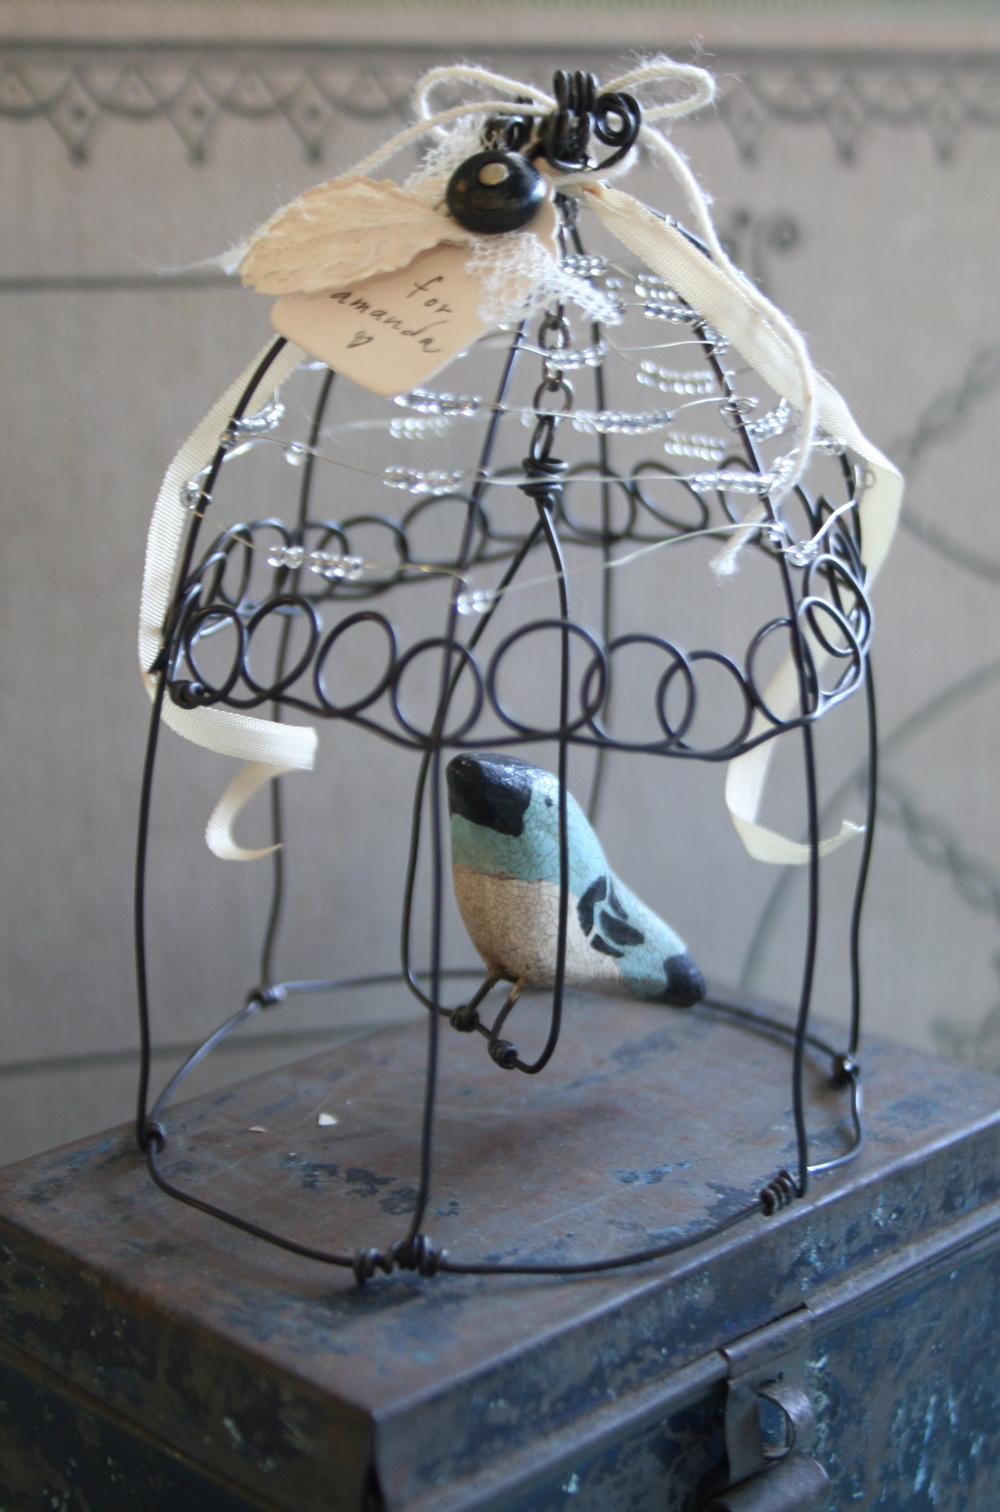 Wire Bird Cage Wiring Diagrams Box Map 236x300 2000 Lincoln Towncar Battery Junction Fuse Diagram The Adventures Of Bluegirlxo Artful Thursdays 17 Rh Theadventuresofbluegirlxo Blogspot Com